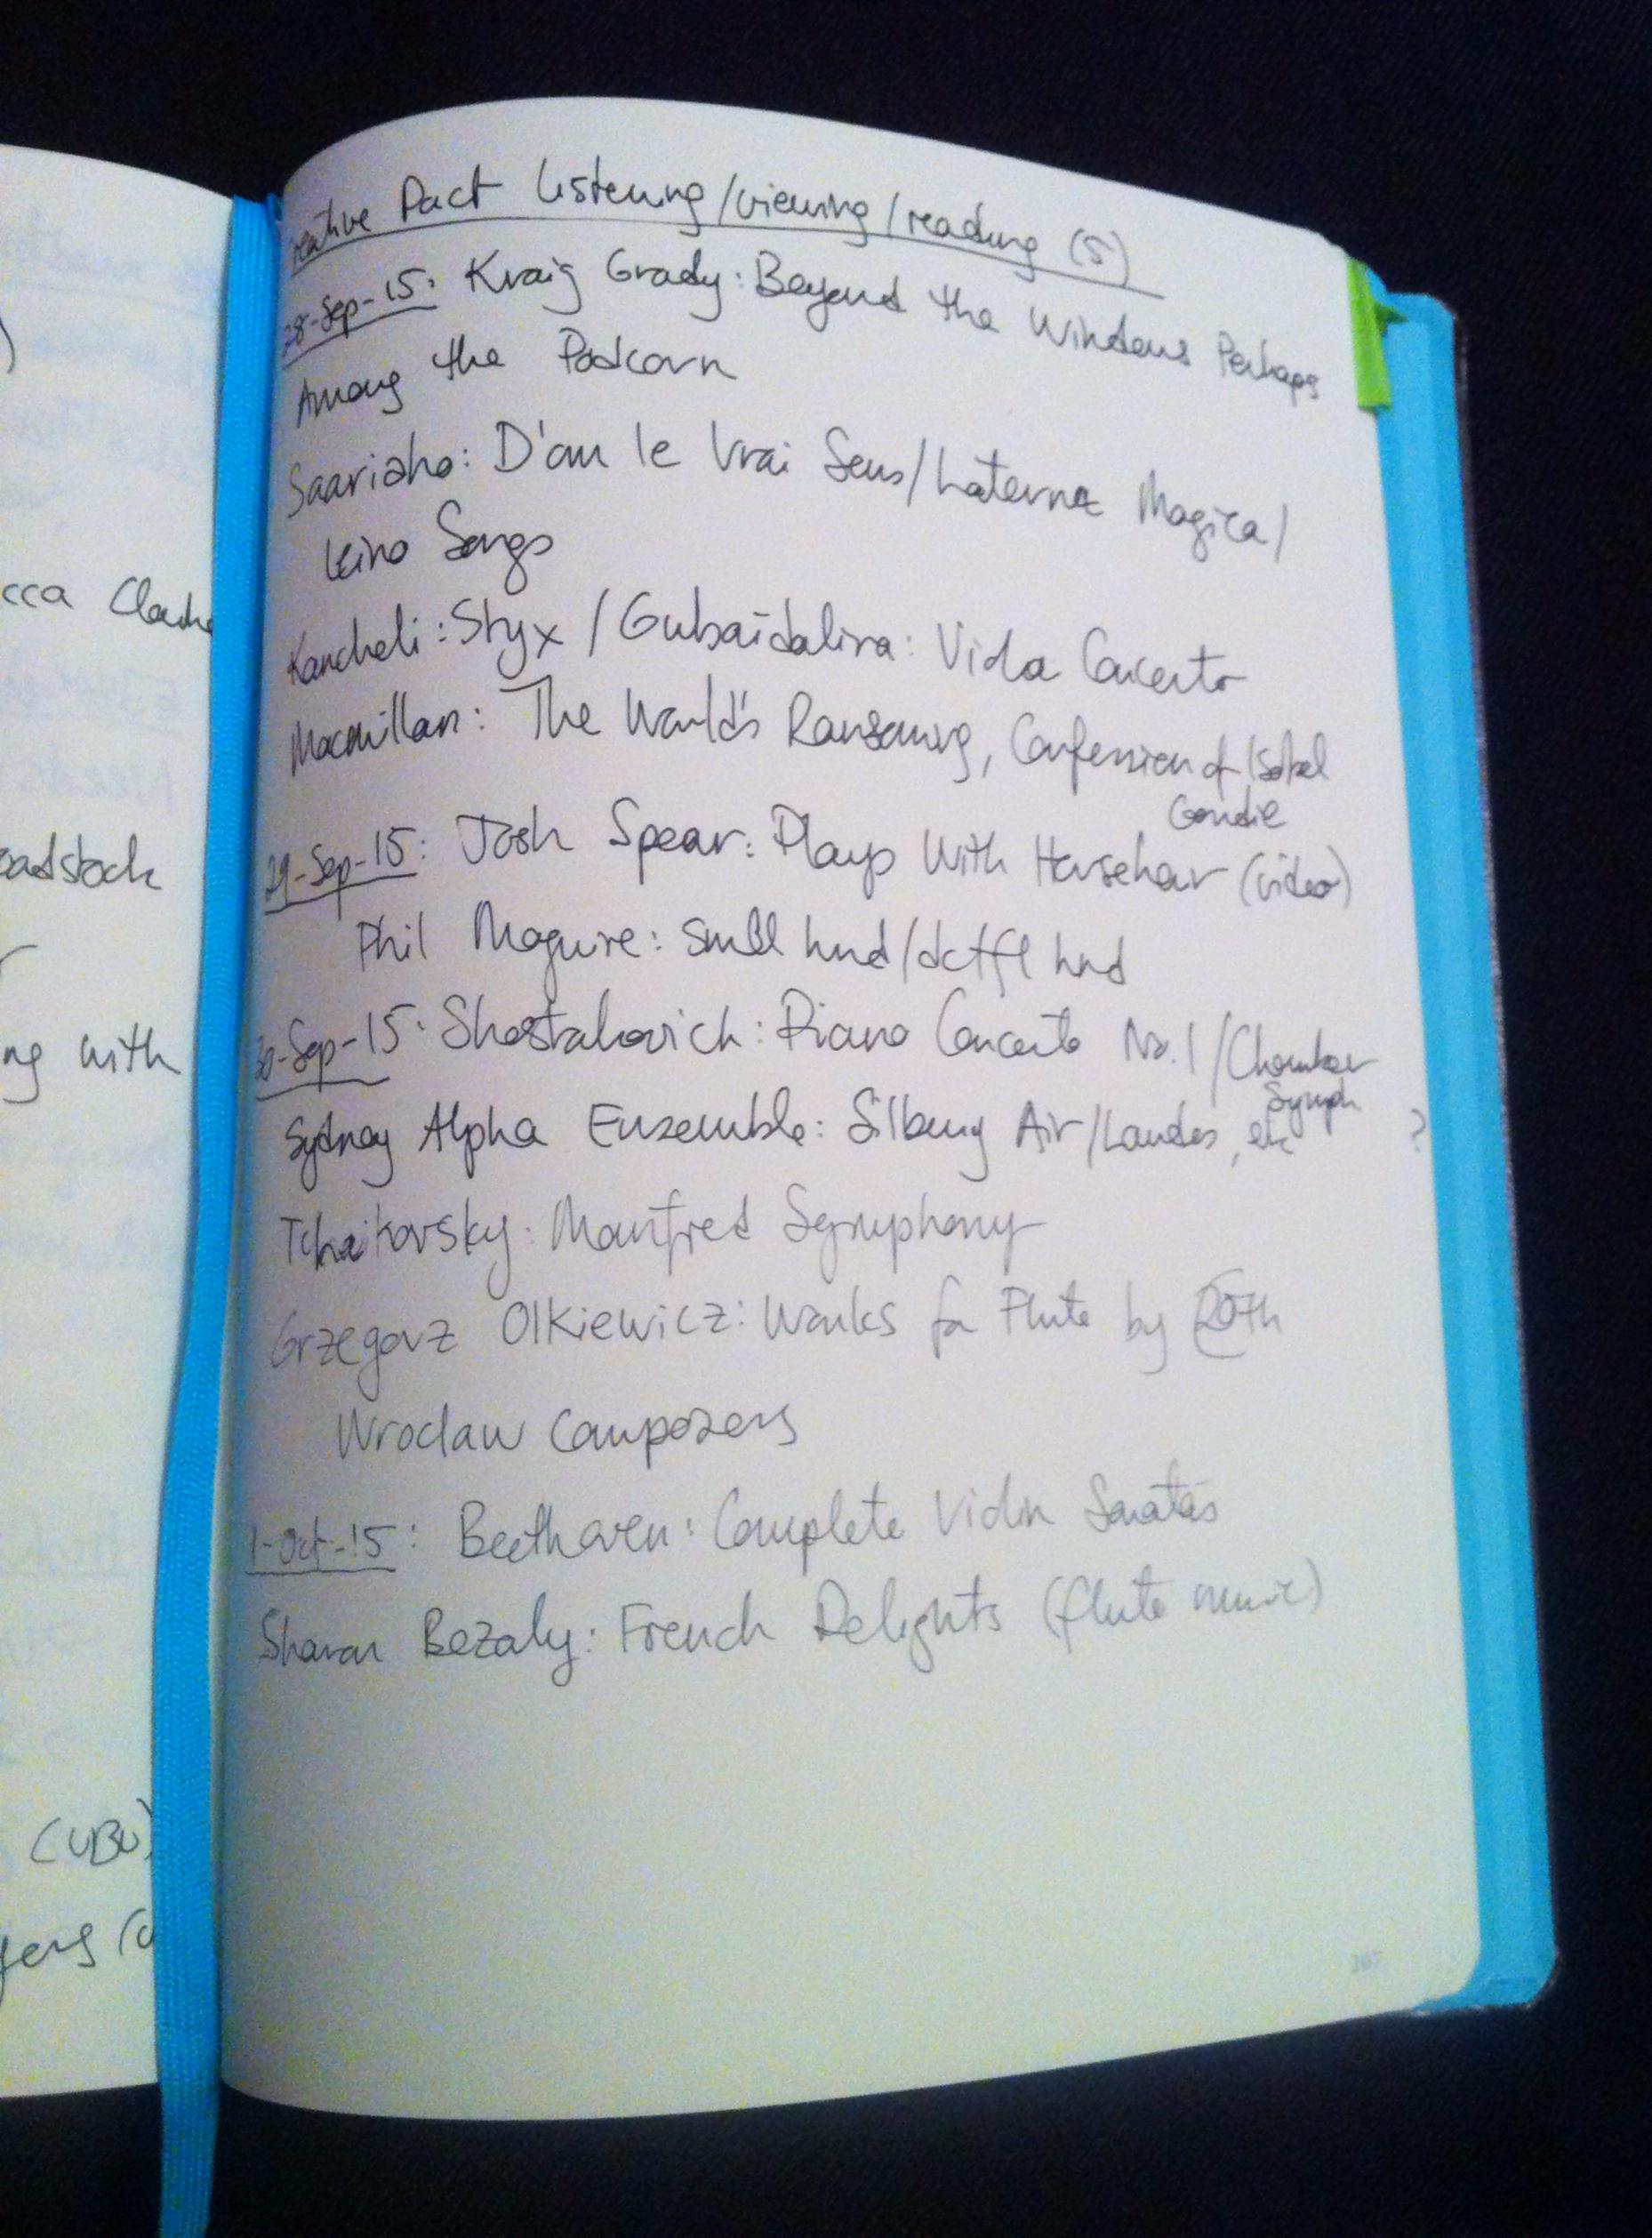 CP 2015 listening/viewing list (5)